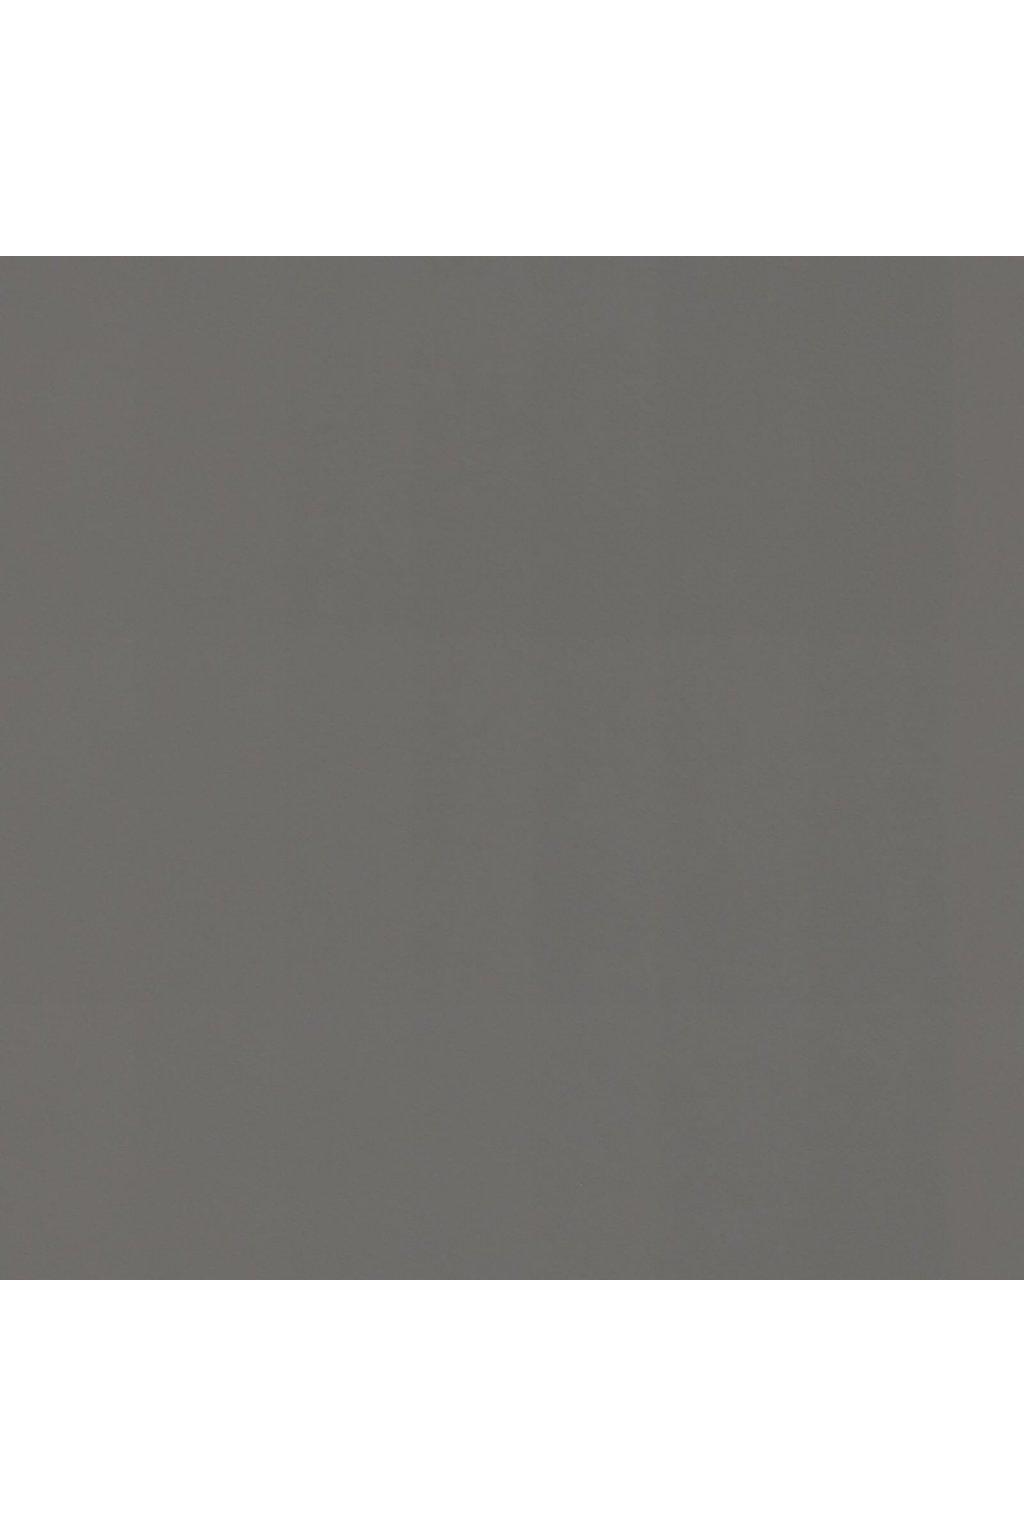 Hrany - LAM - 23x0,5 - zadní panel Dark Grey